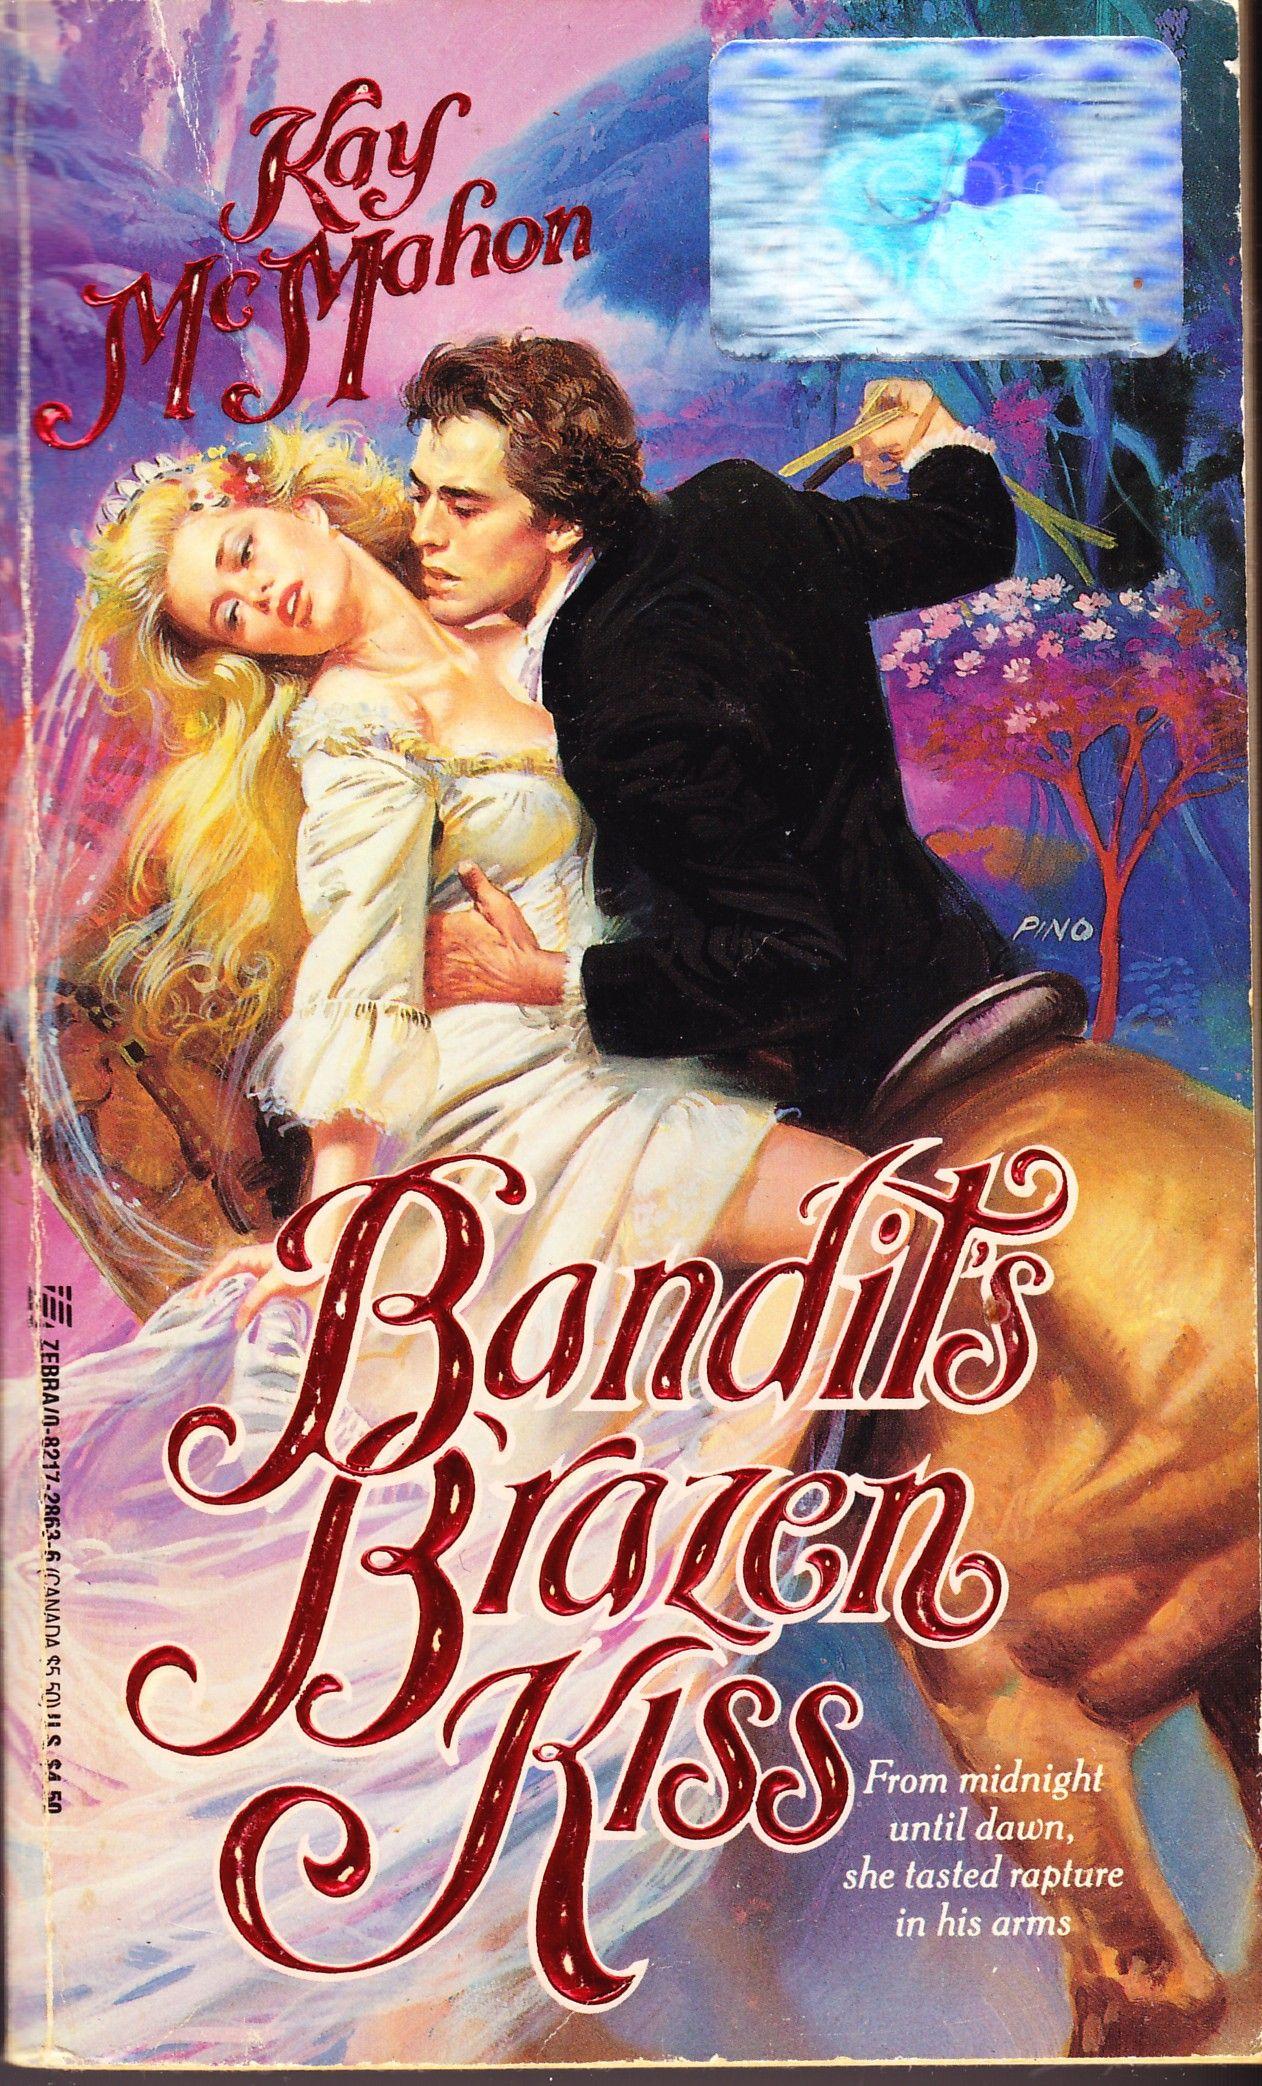 Bandit S Brazen Kiss Kay Mcmahon Romance Novel Covers Romance Covers Art Historical Romance Book Covers